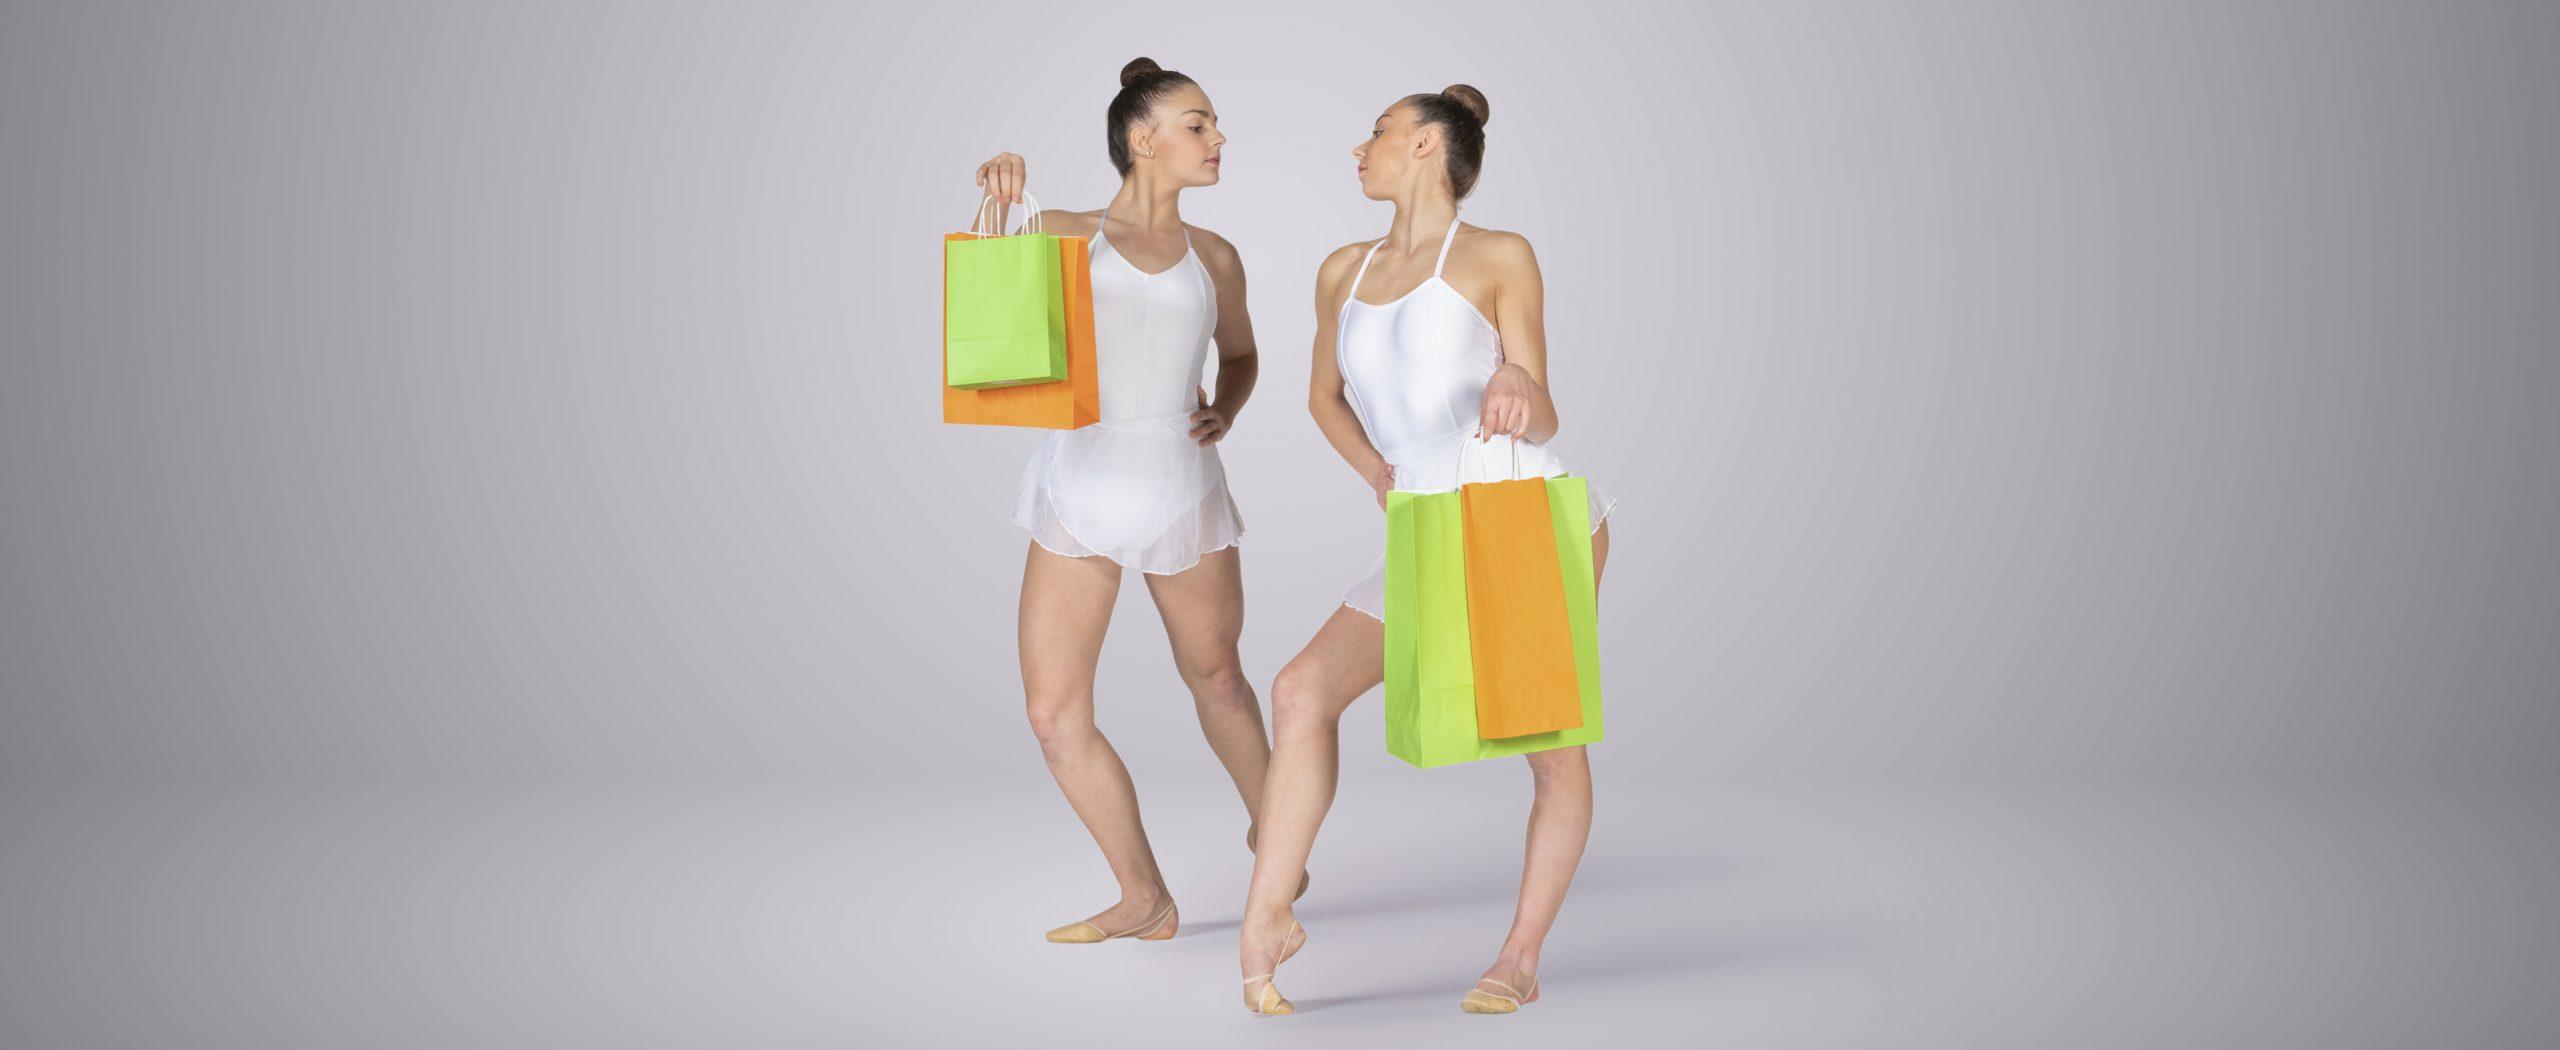 Ginnaste borse colorate in carta